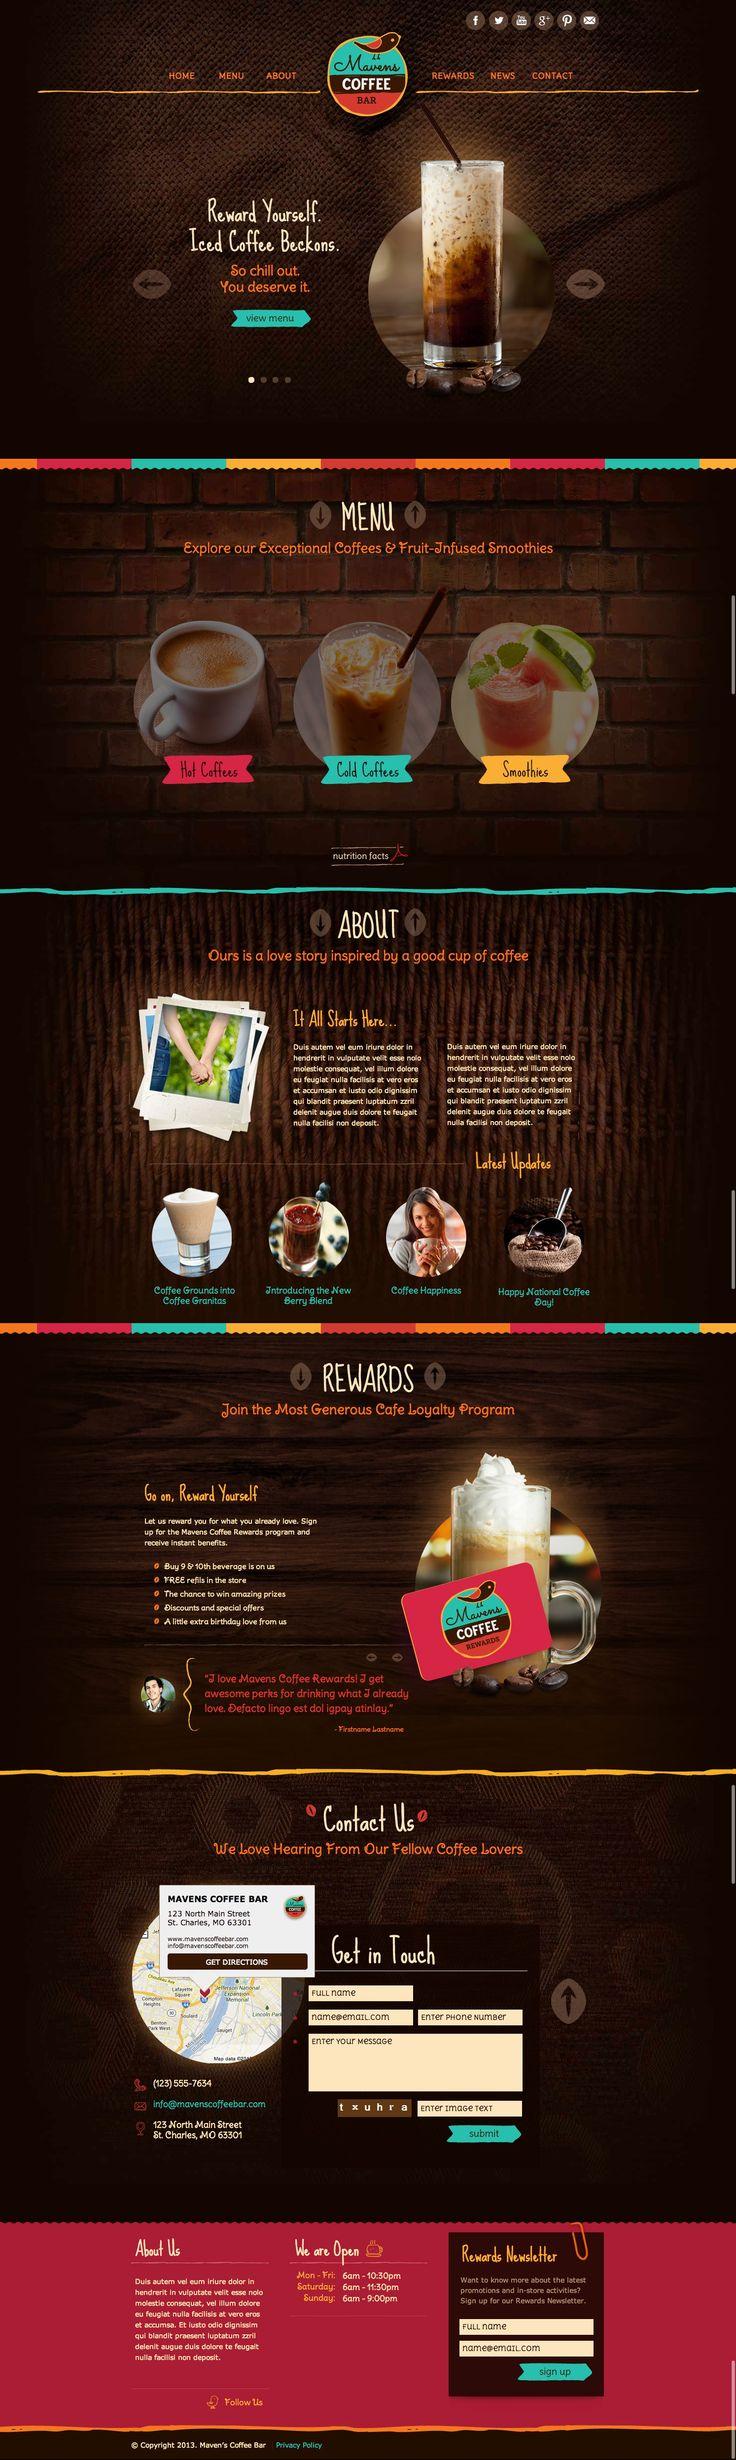 Mavens Coffee Template #webdesign #template